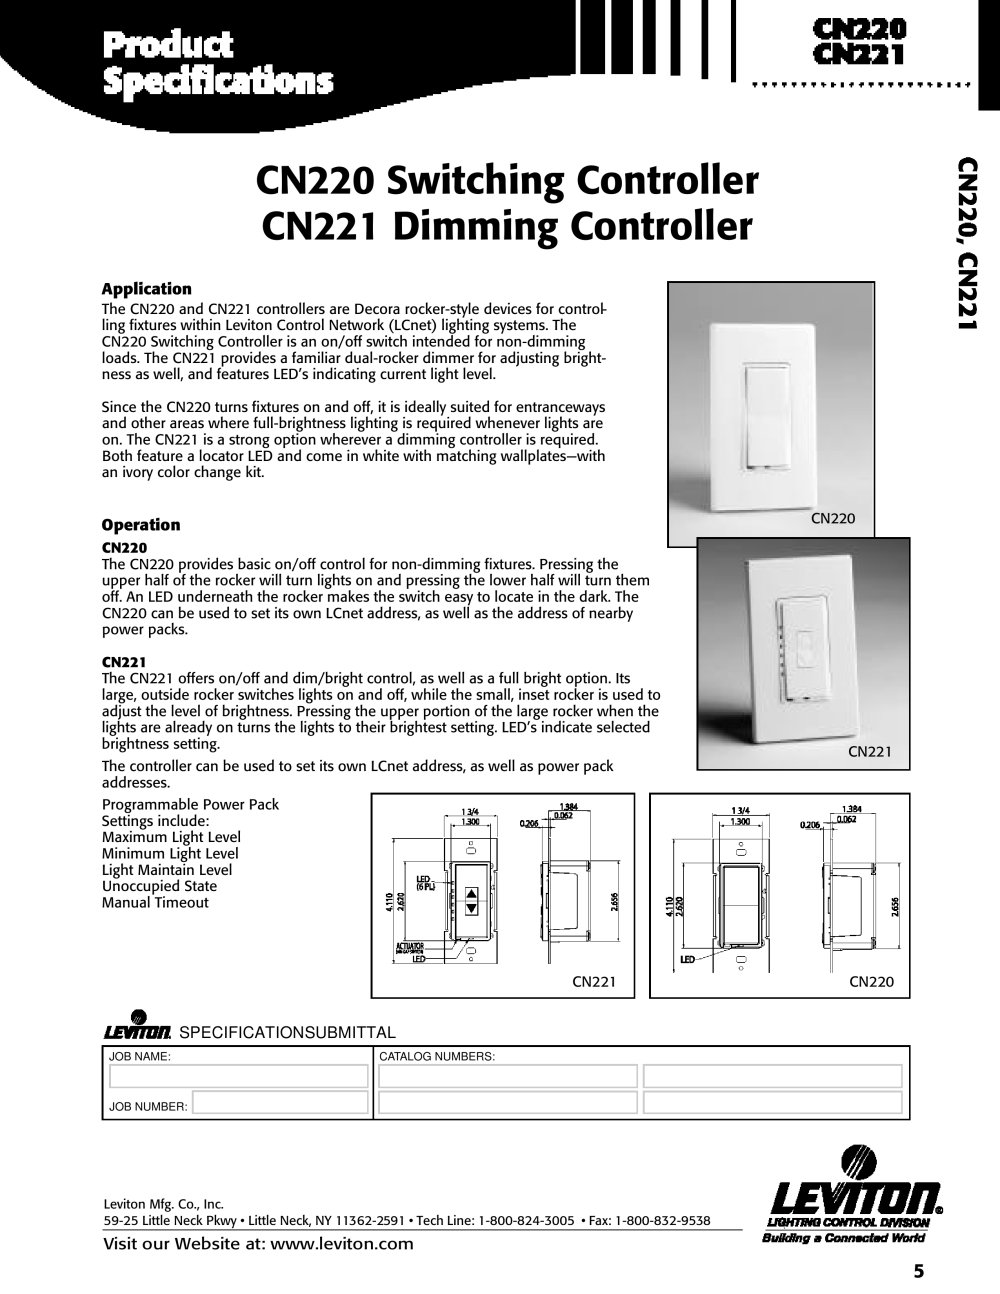 CN220 Switching Controller CN221 Dimming Controller - Leviton - PDF ...